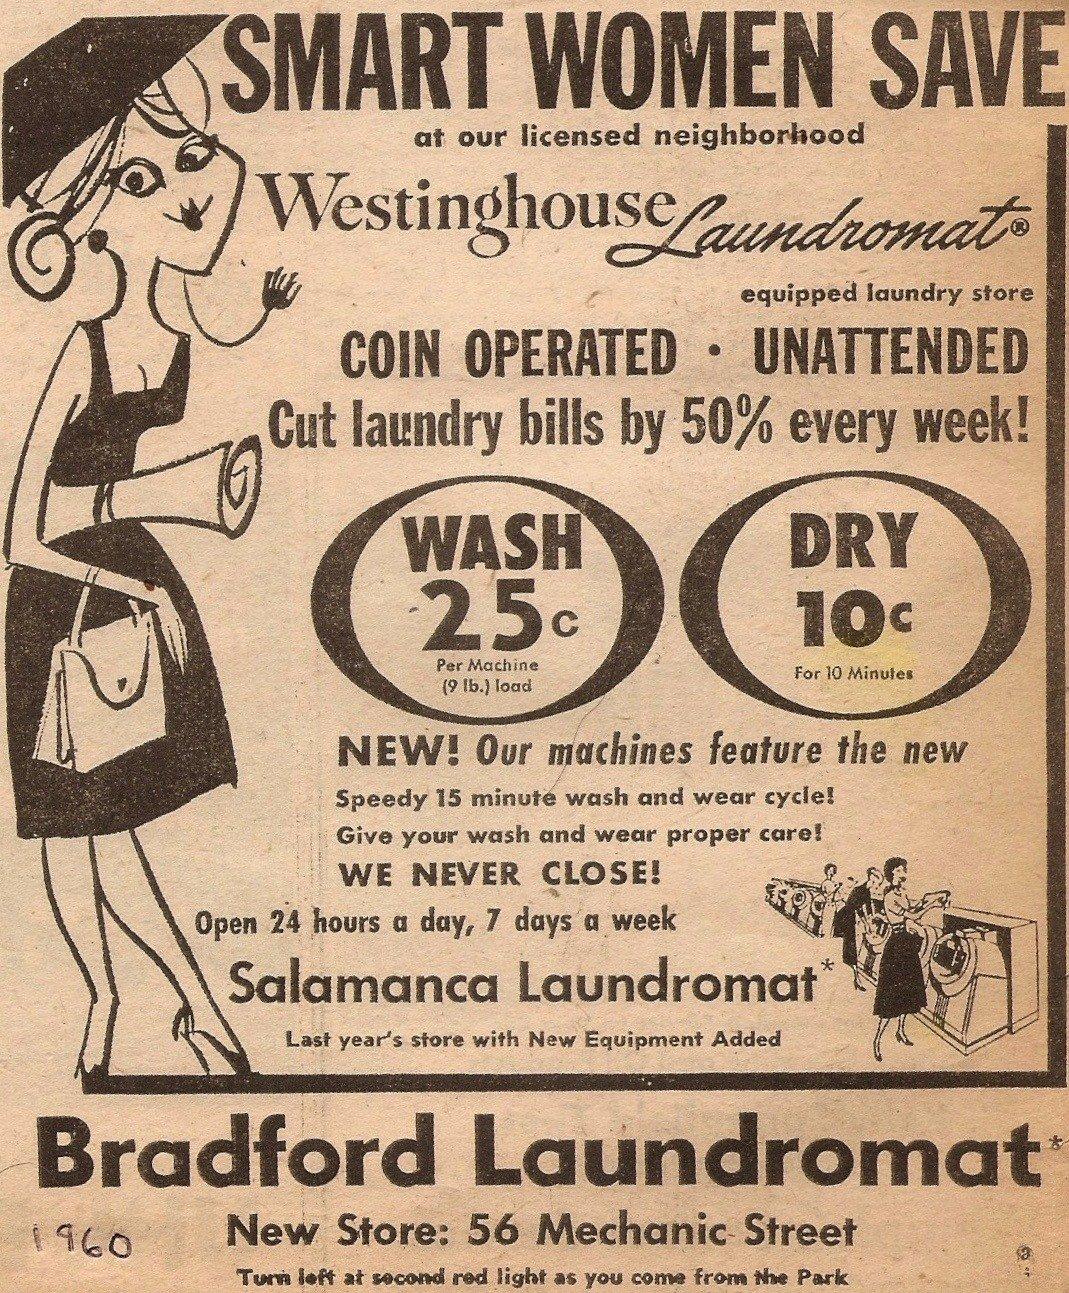 Bradford Laundromat - 56 Mechanic Street, Bradford Pennsylvania U.S.A. - 1960